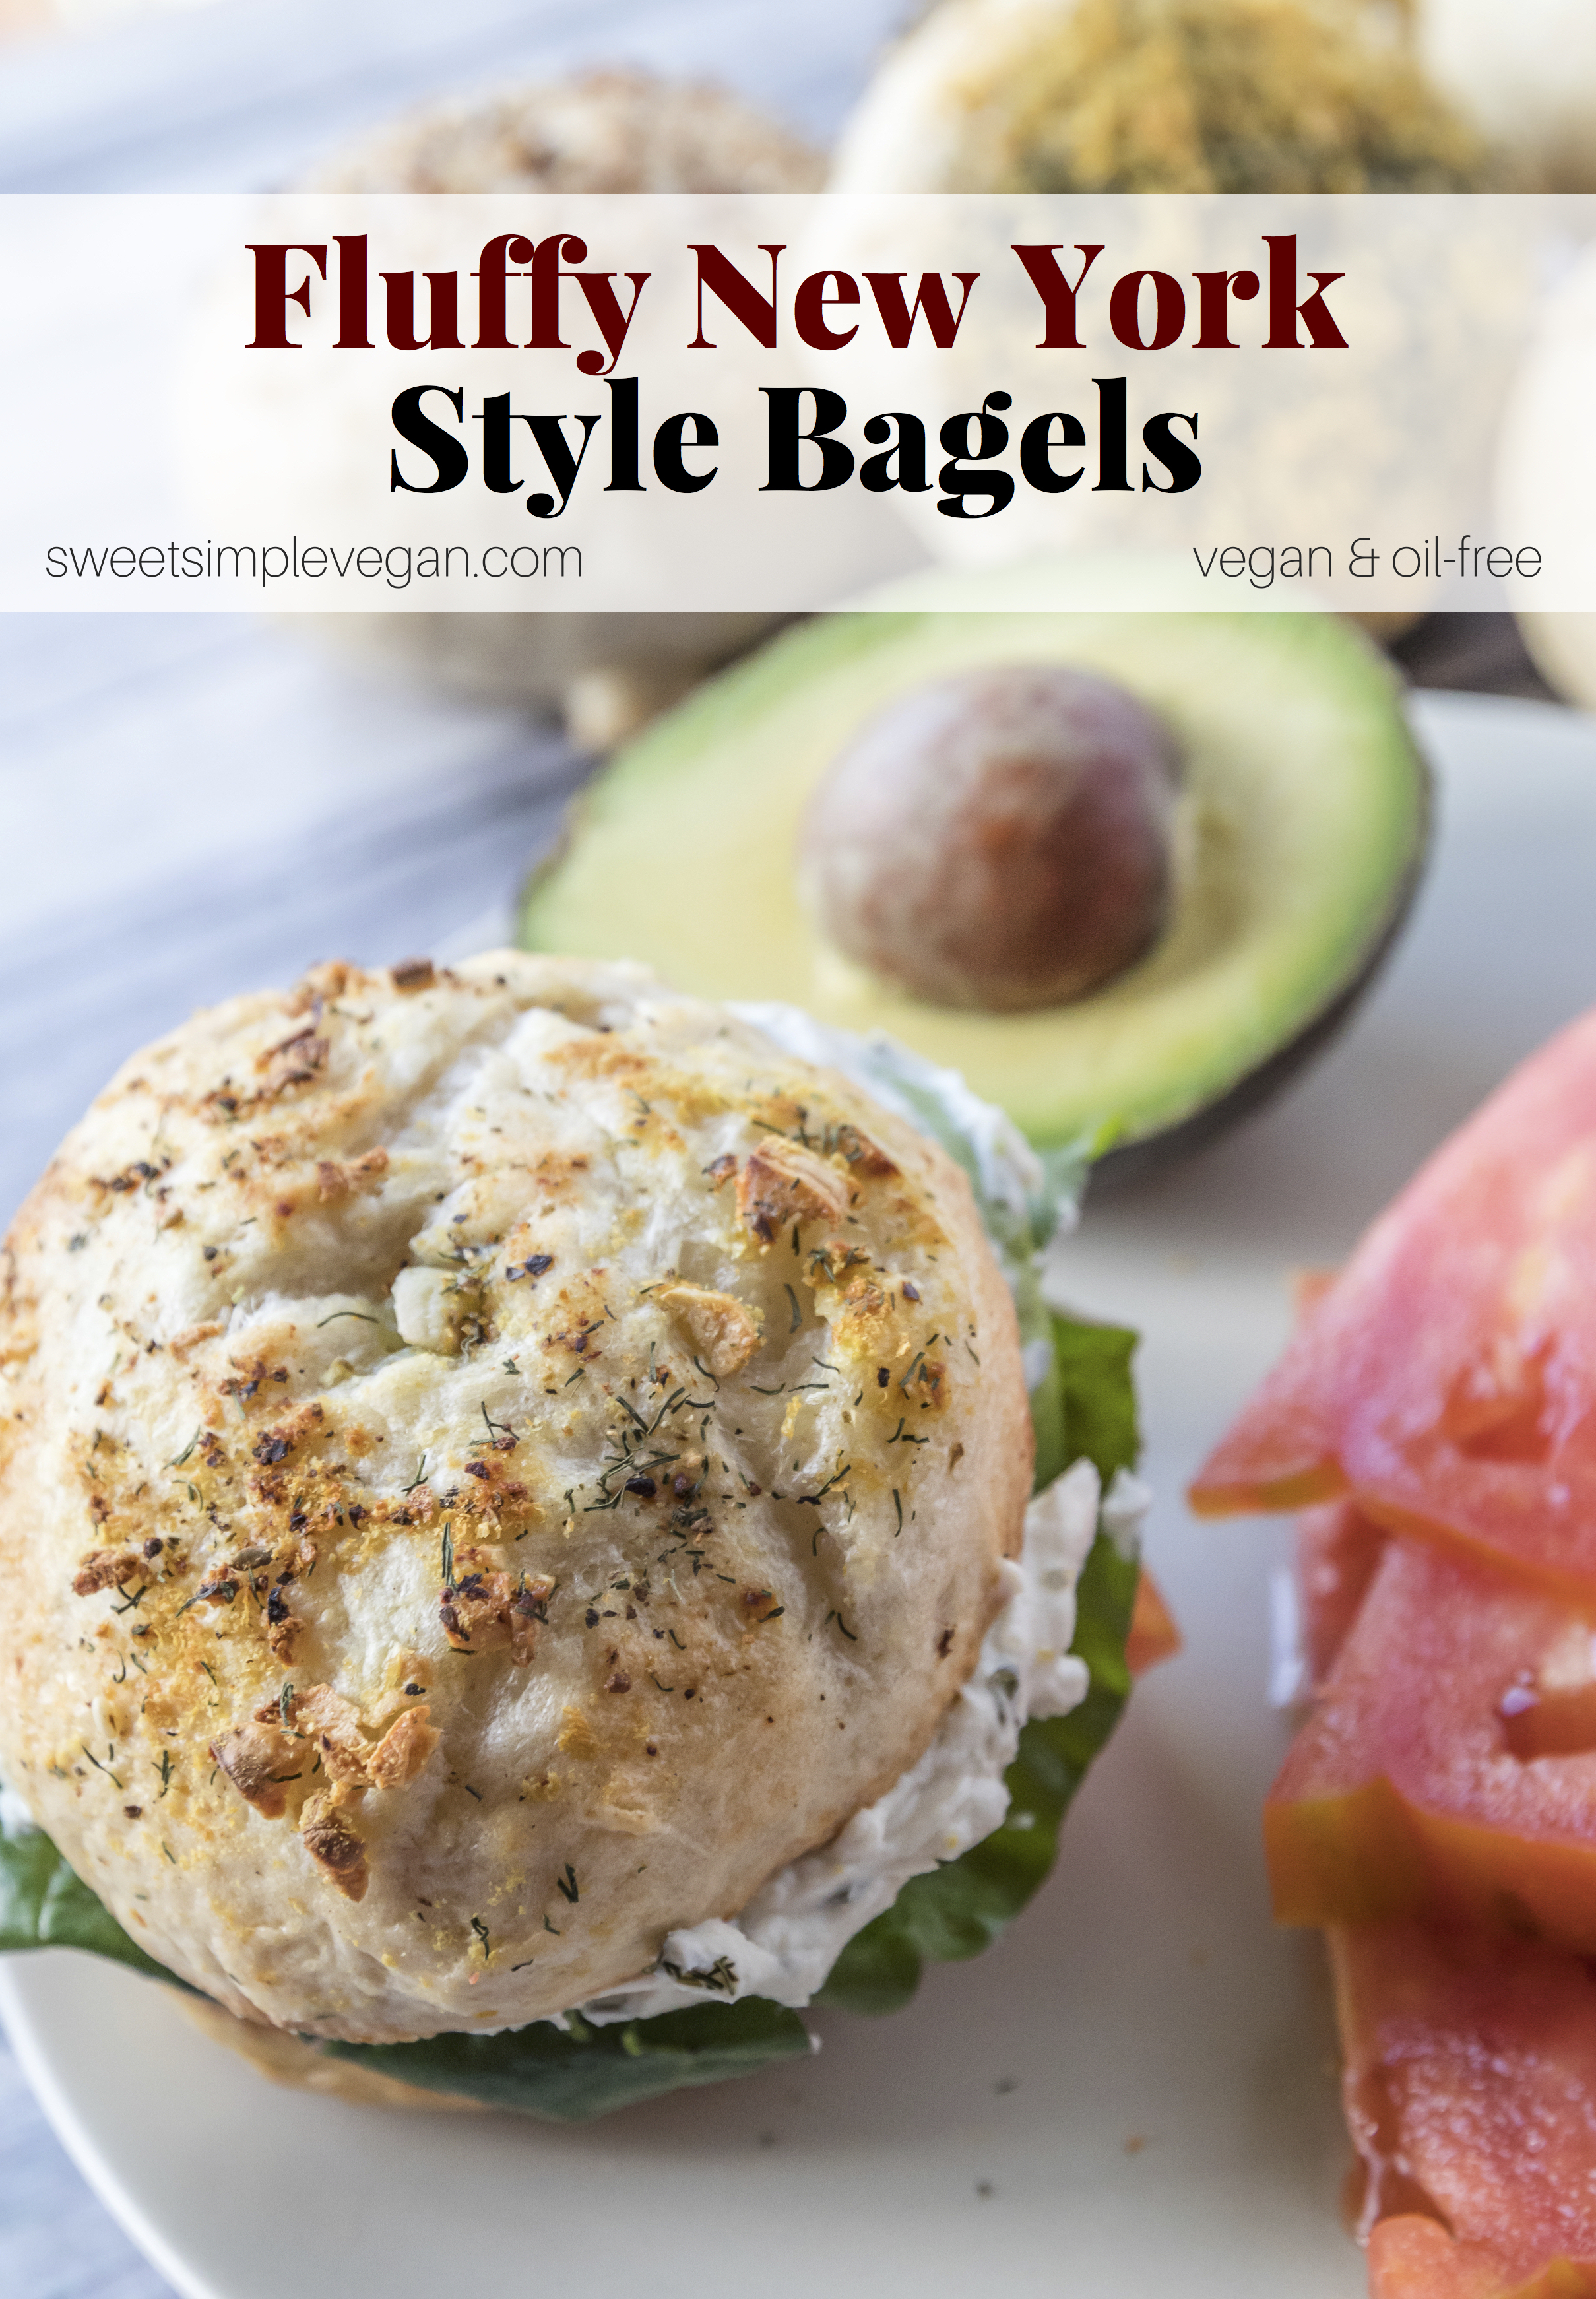 Fluffy New York-Style Bagels (vegan, oil-free) sweetsimplevegan.com